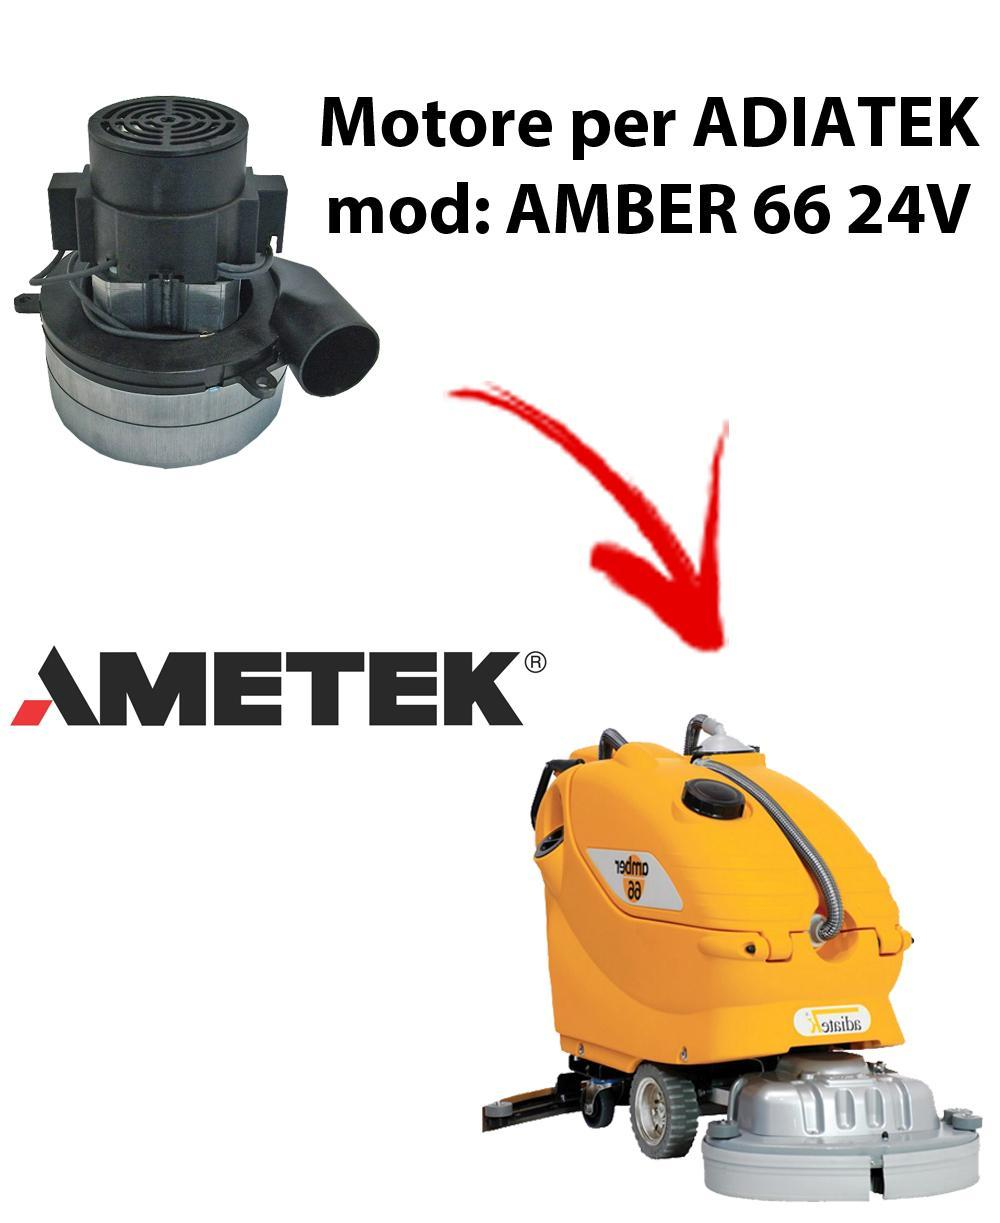 Amber 66 - 24 volt Vacuum motors AMETEK Italia for scrubber dryer Adiatek